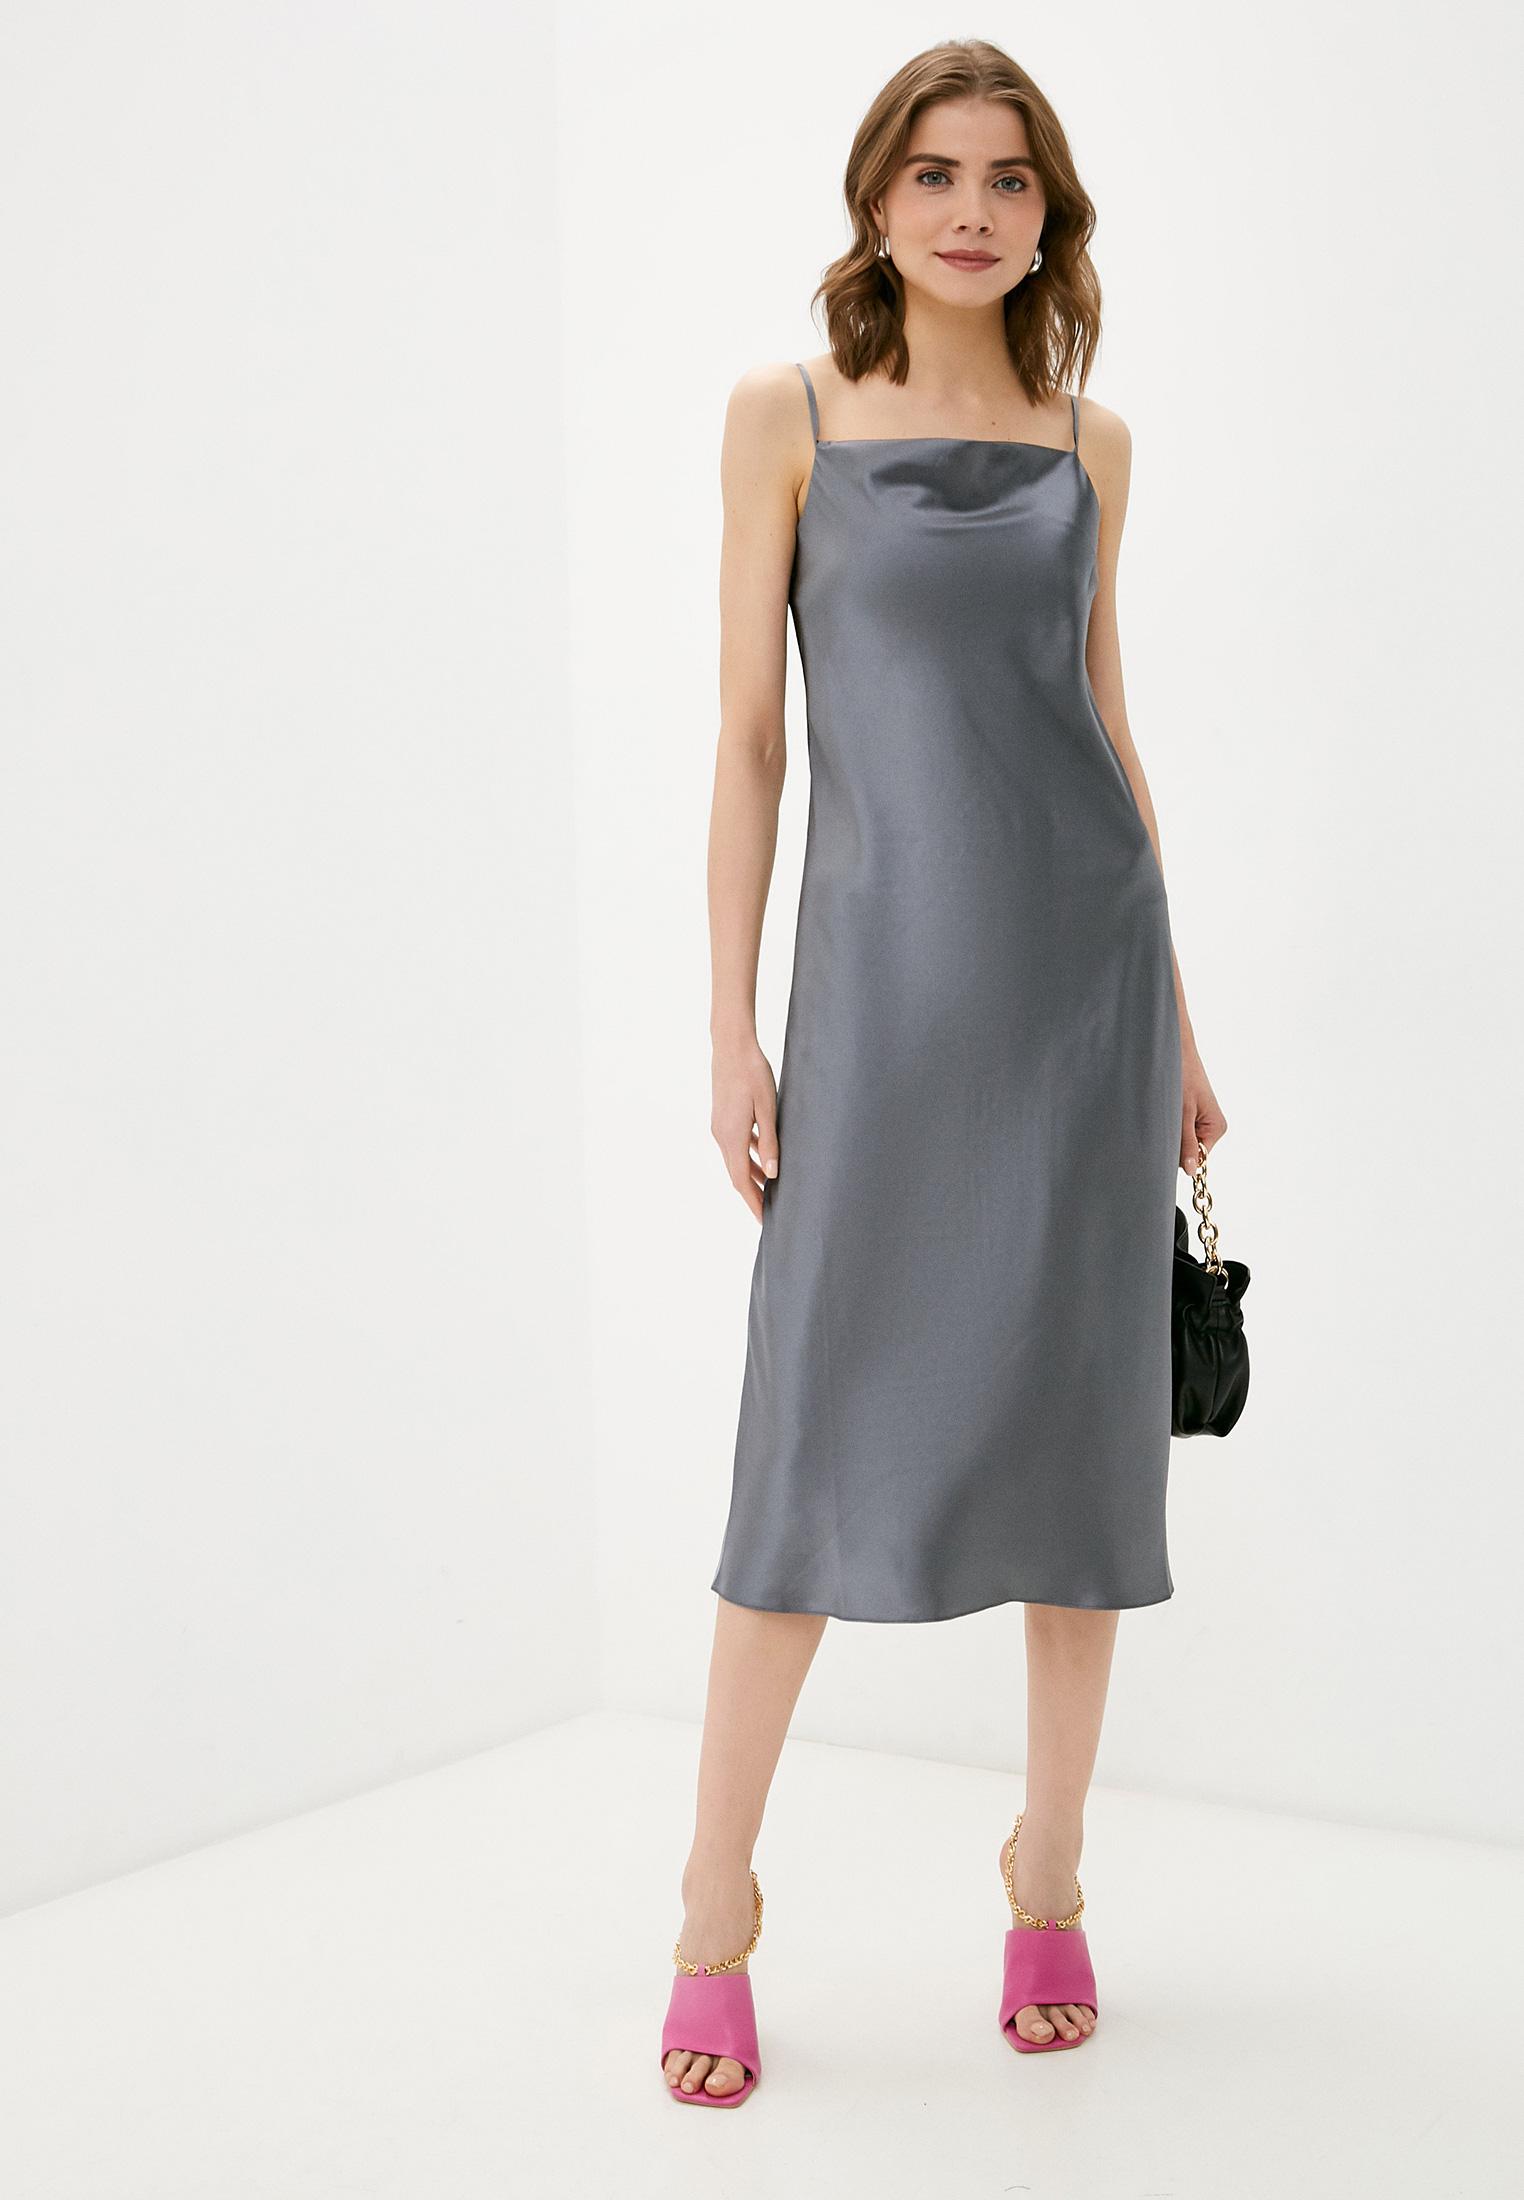 Платье SHARTREZ 114-П